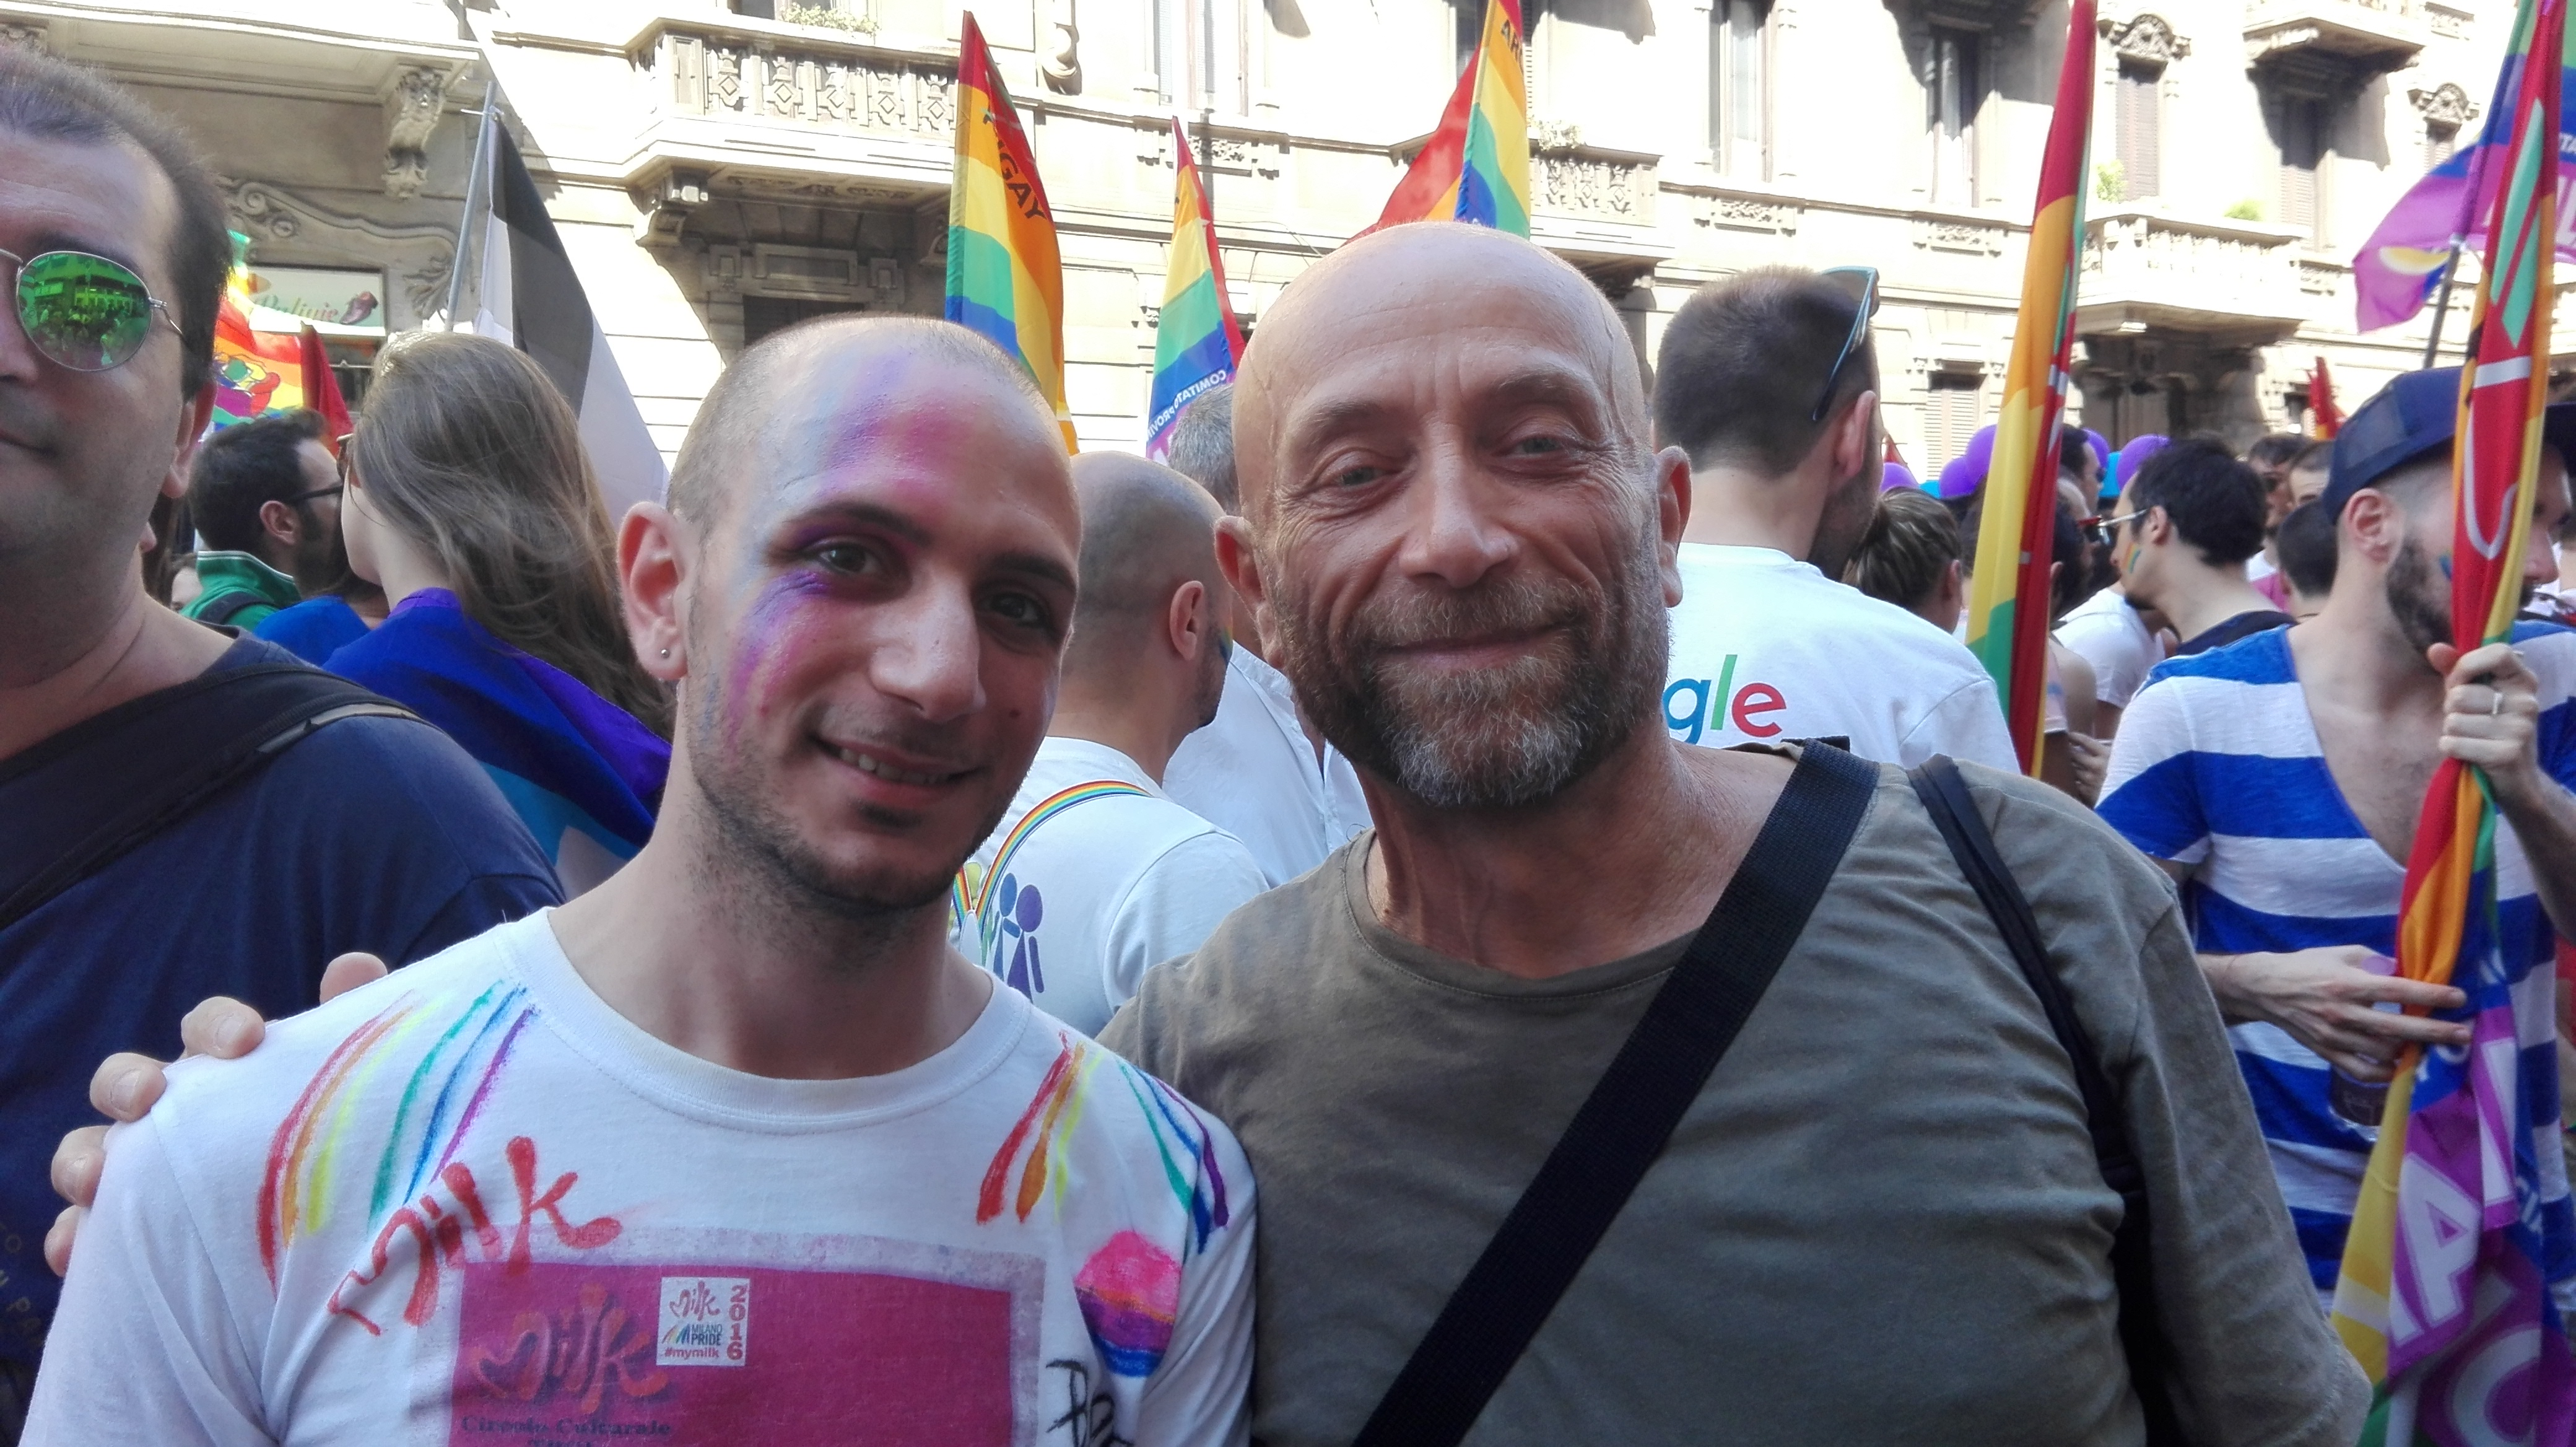 annunci erotici lombardia feticismo gay